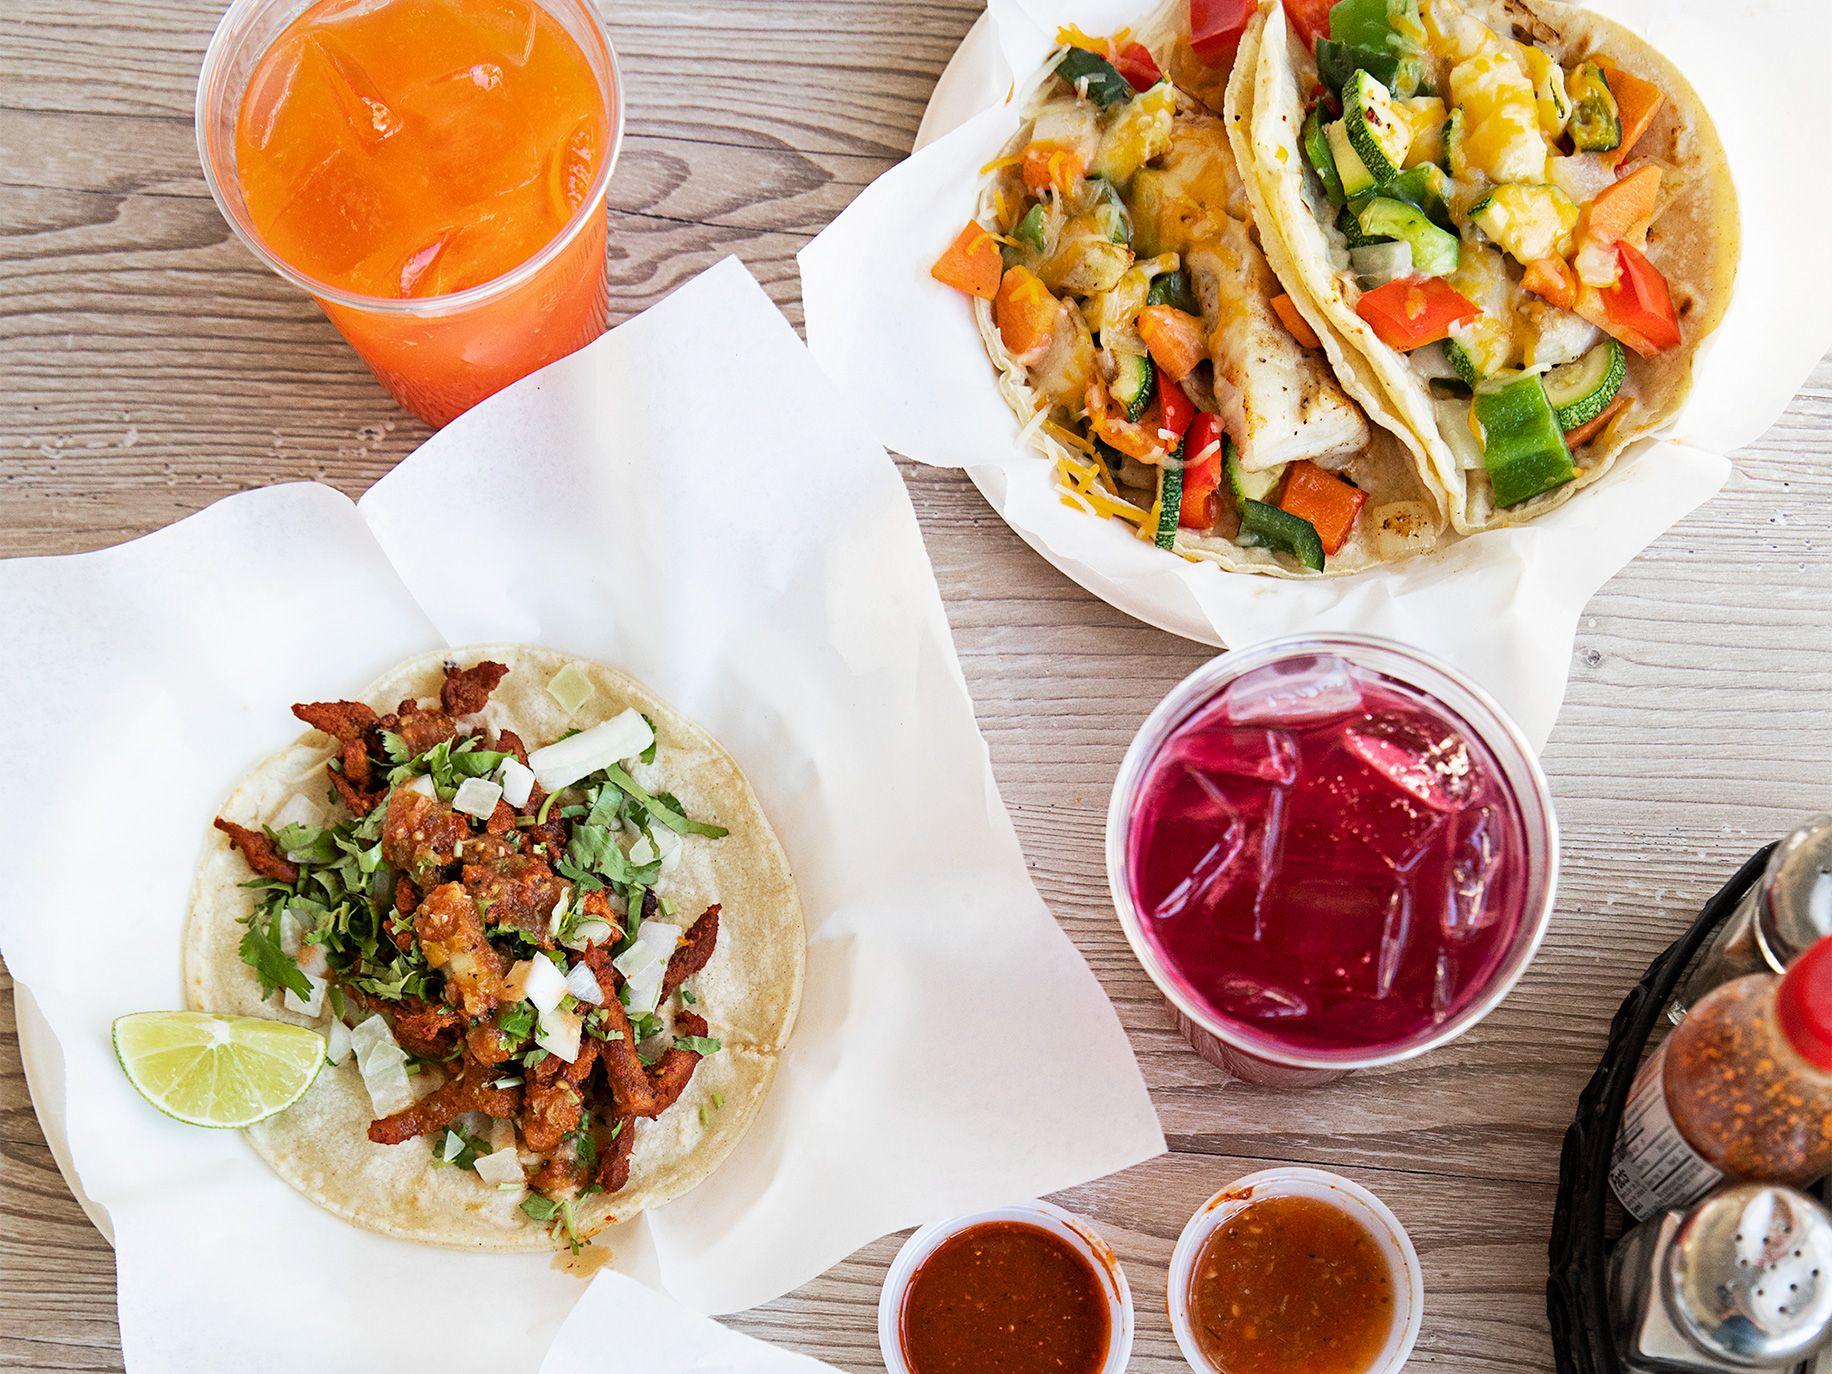 Tasty tacos from El Bajio, top to bottom: fish and al pastor.